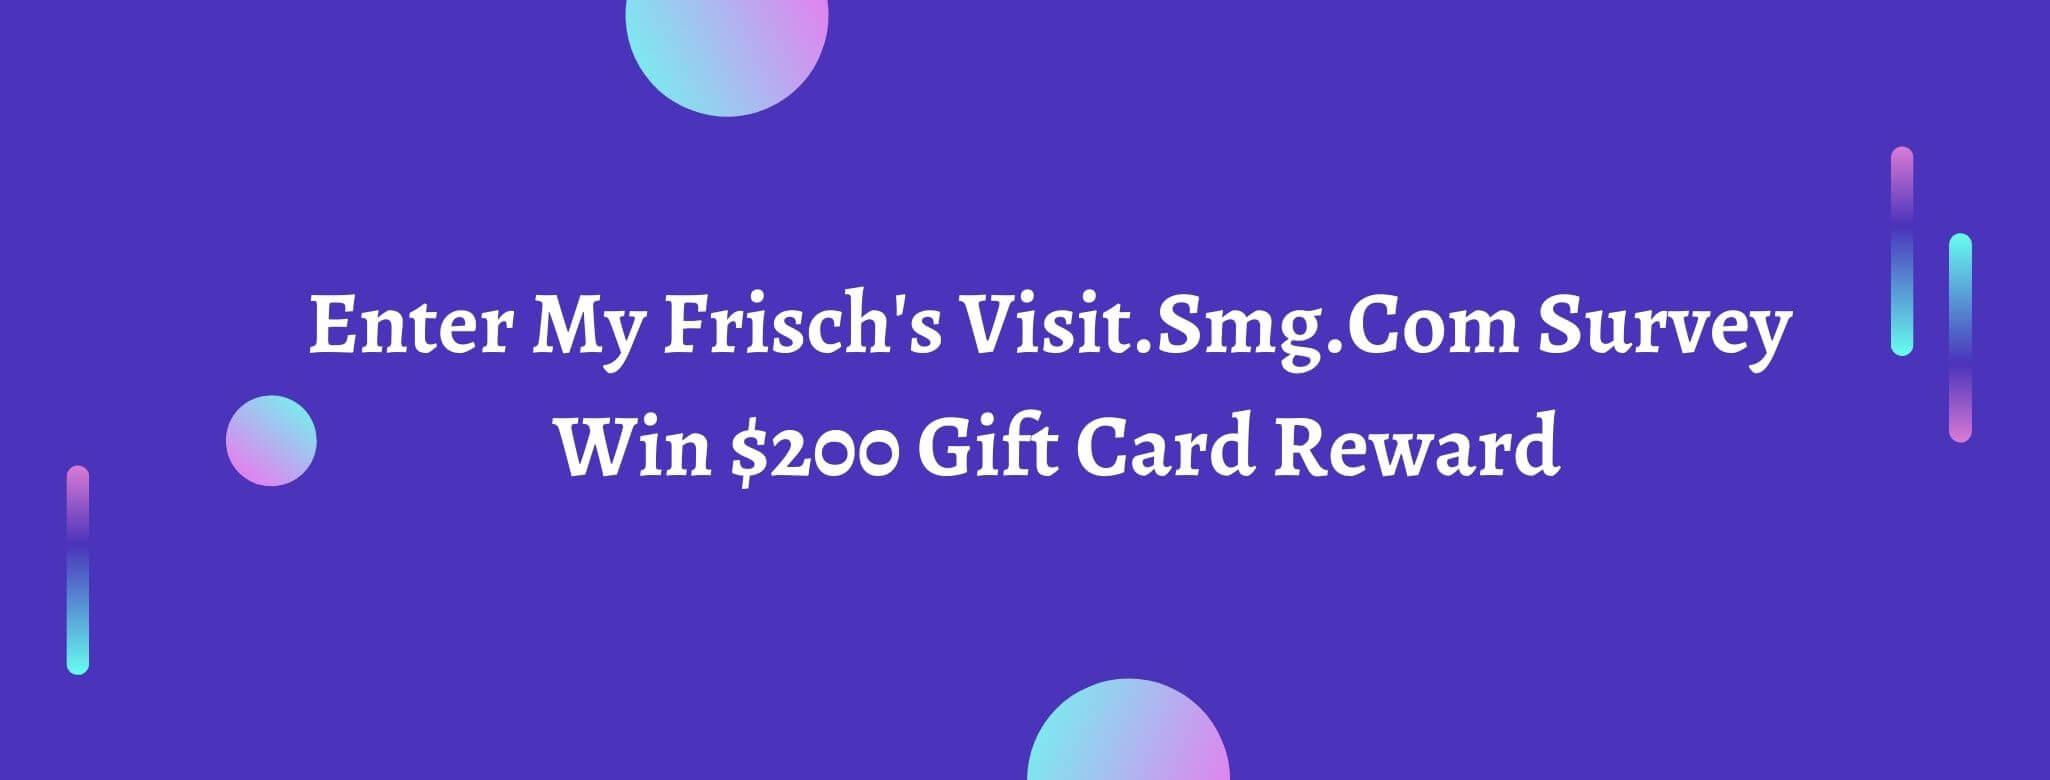 my frischs visit.smg.com